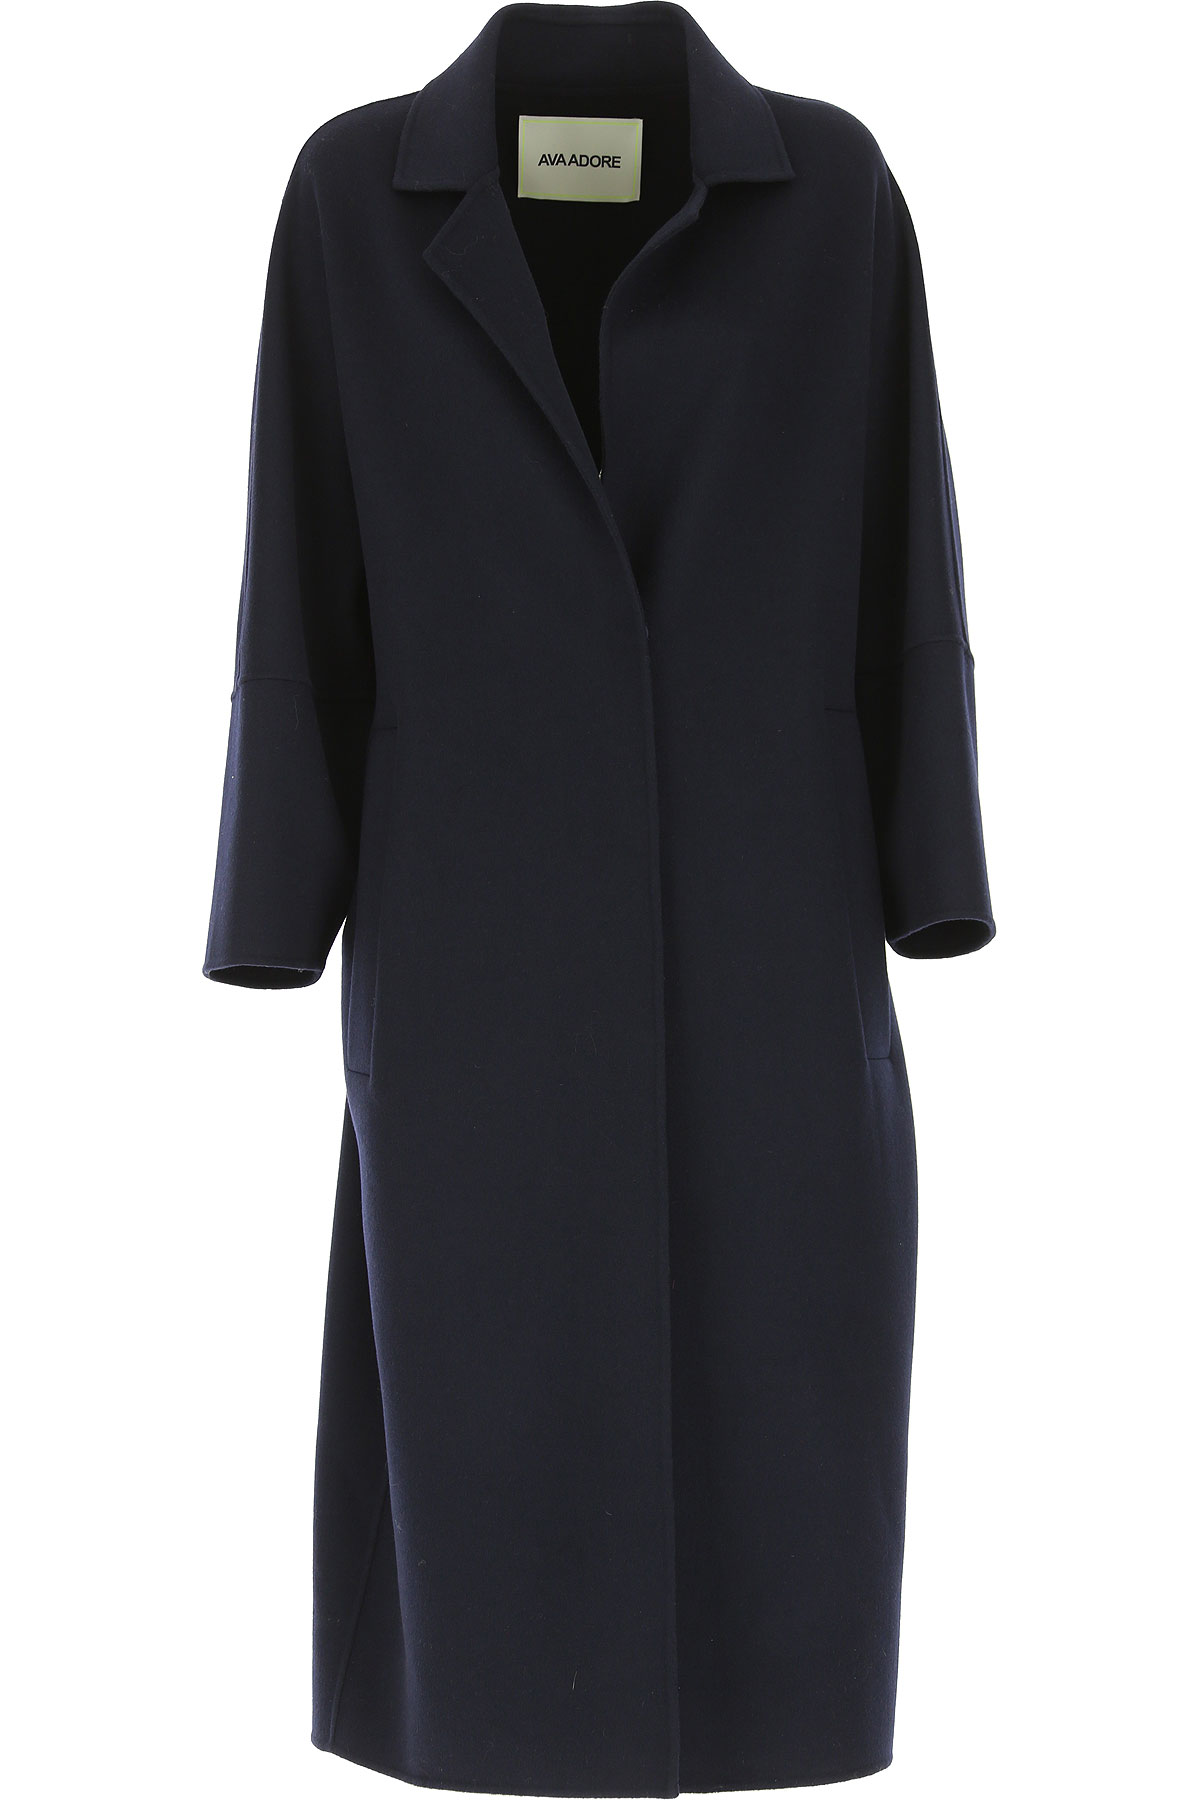 Image of Ava Adore Women\'s Coat, Navy Blue, Wool, 2017, 4 6